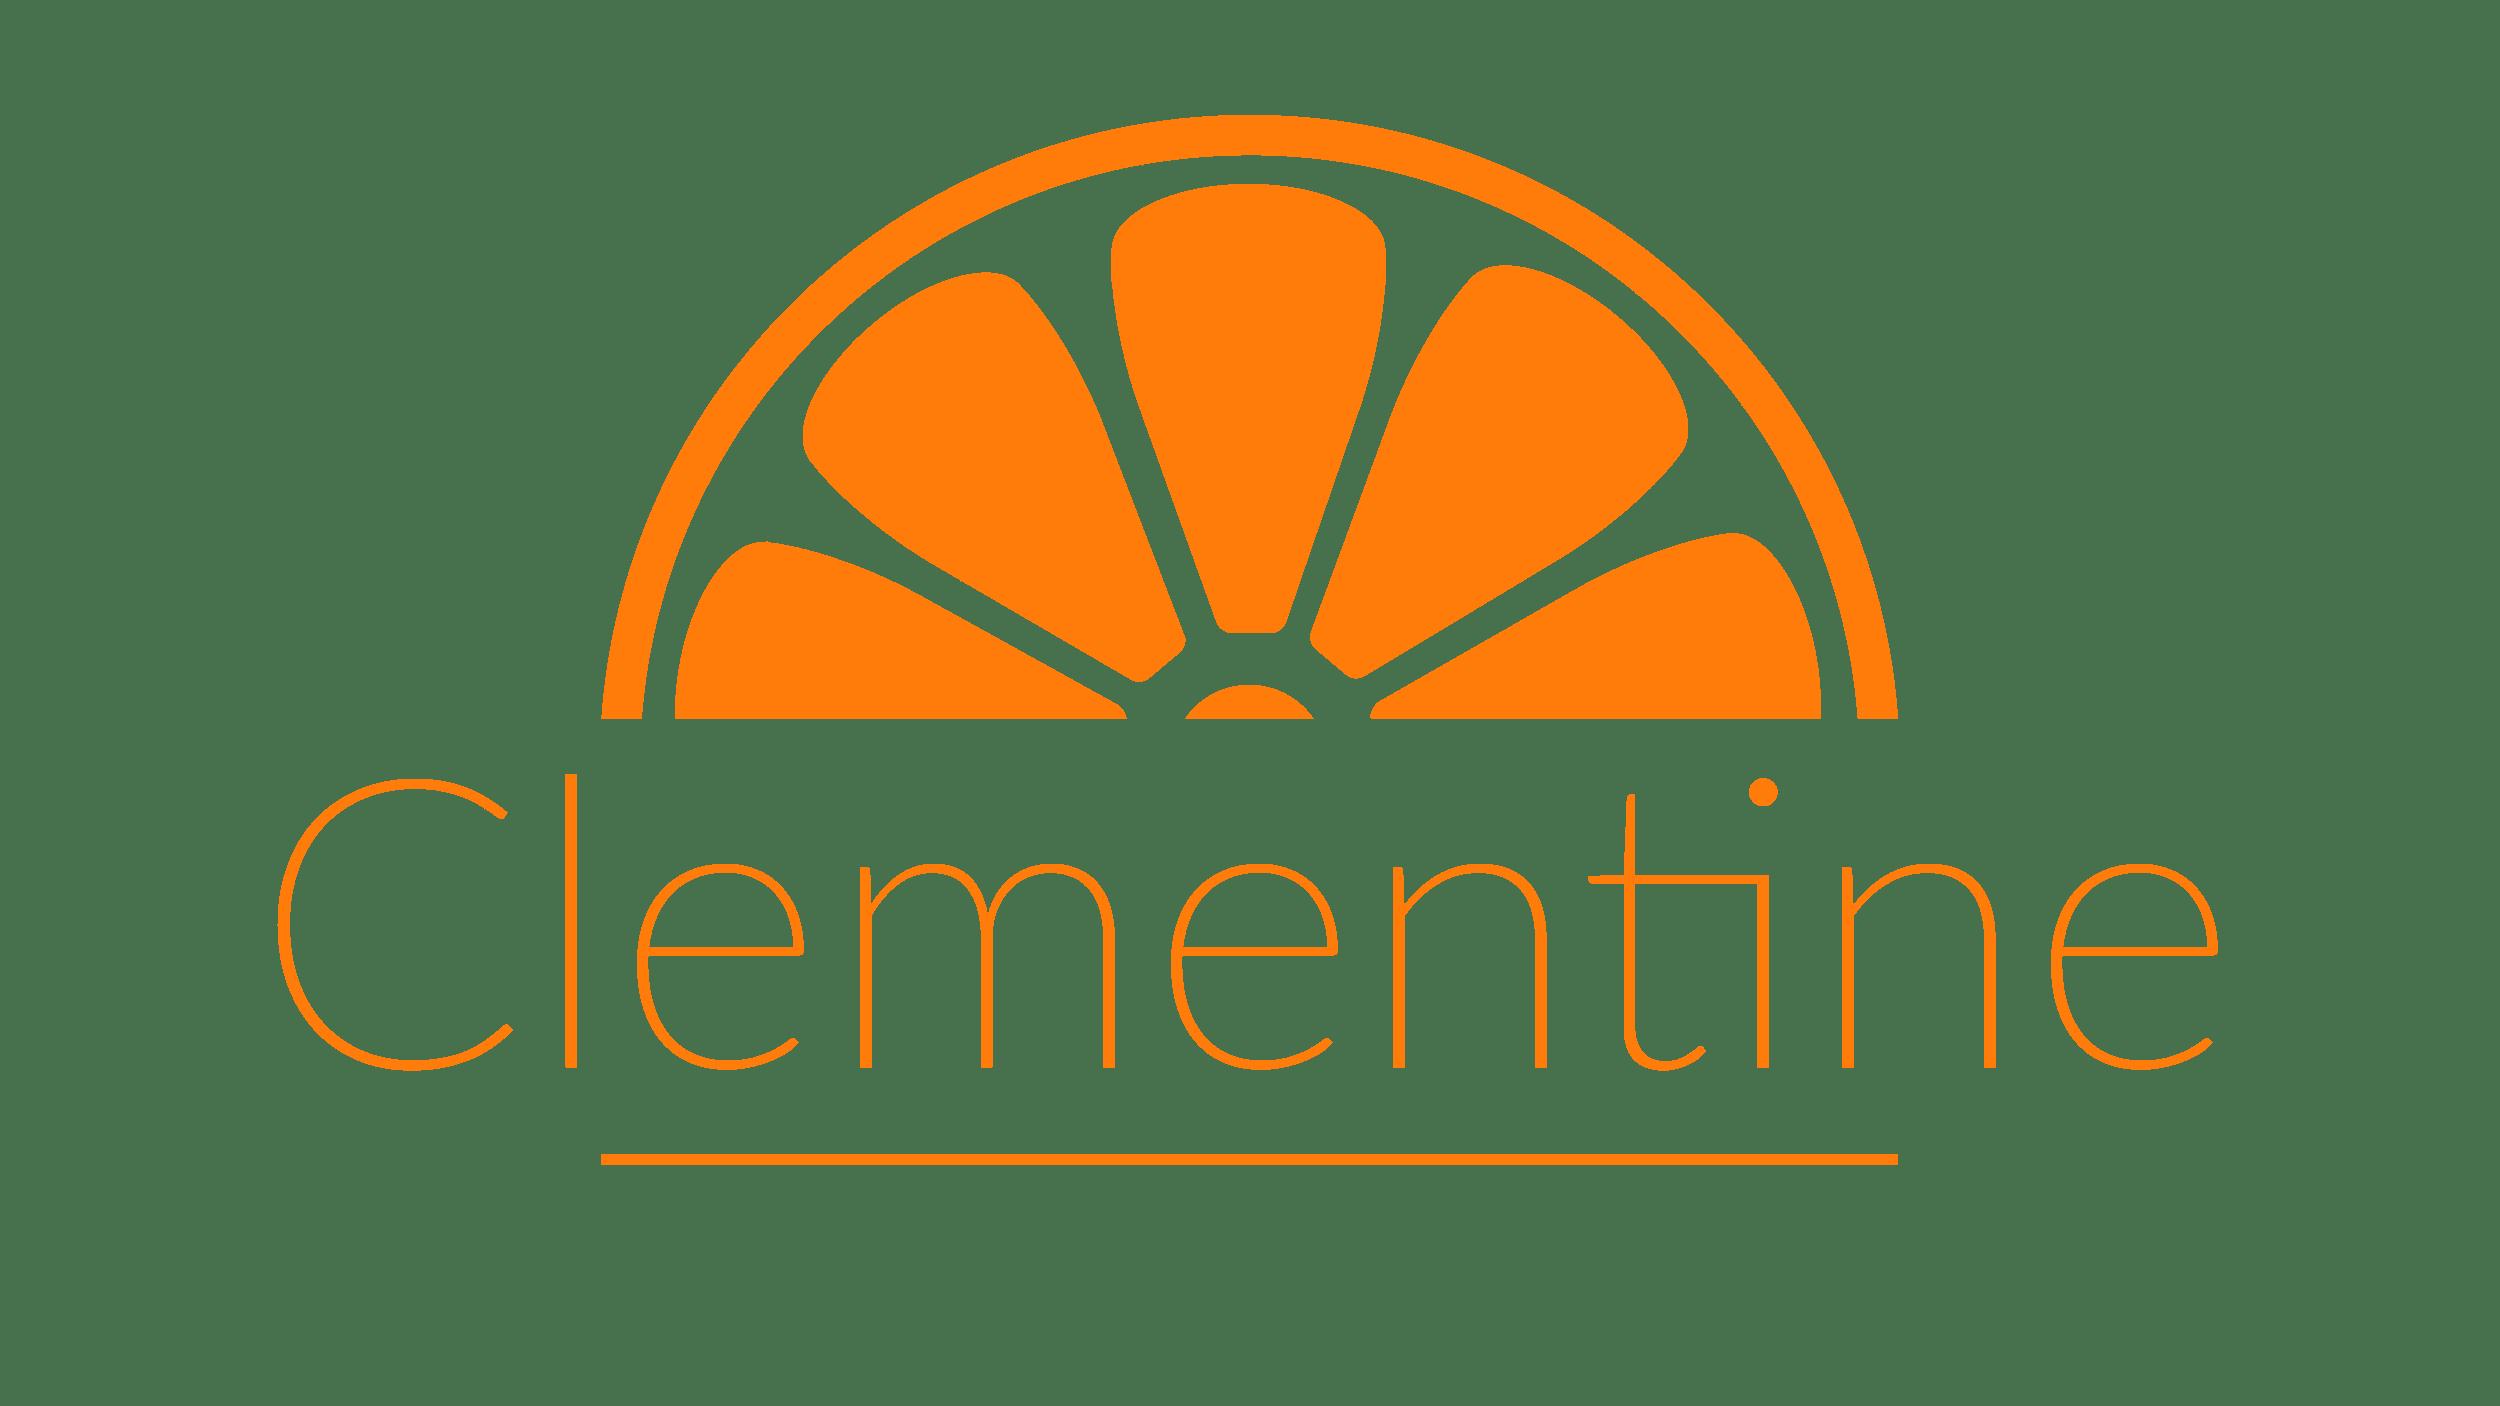 AskClementine